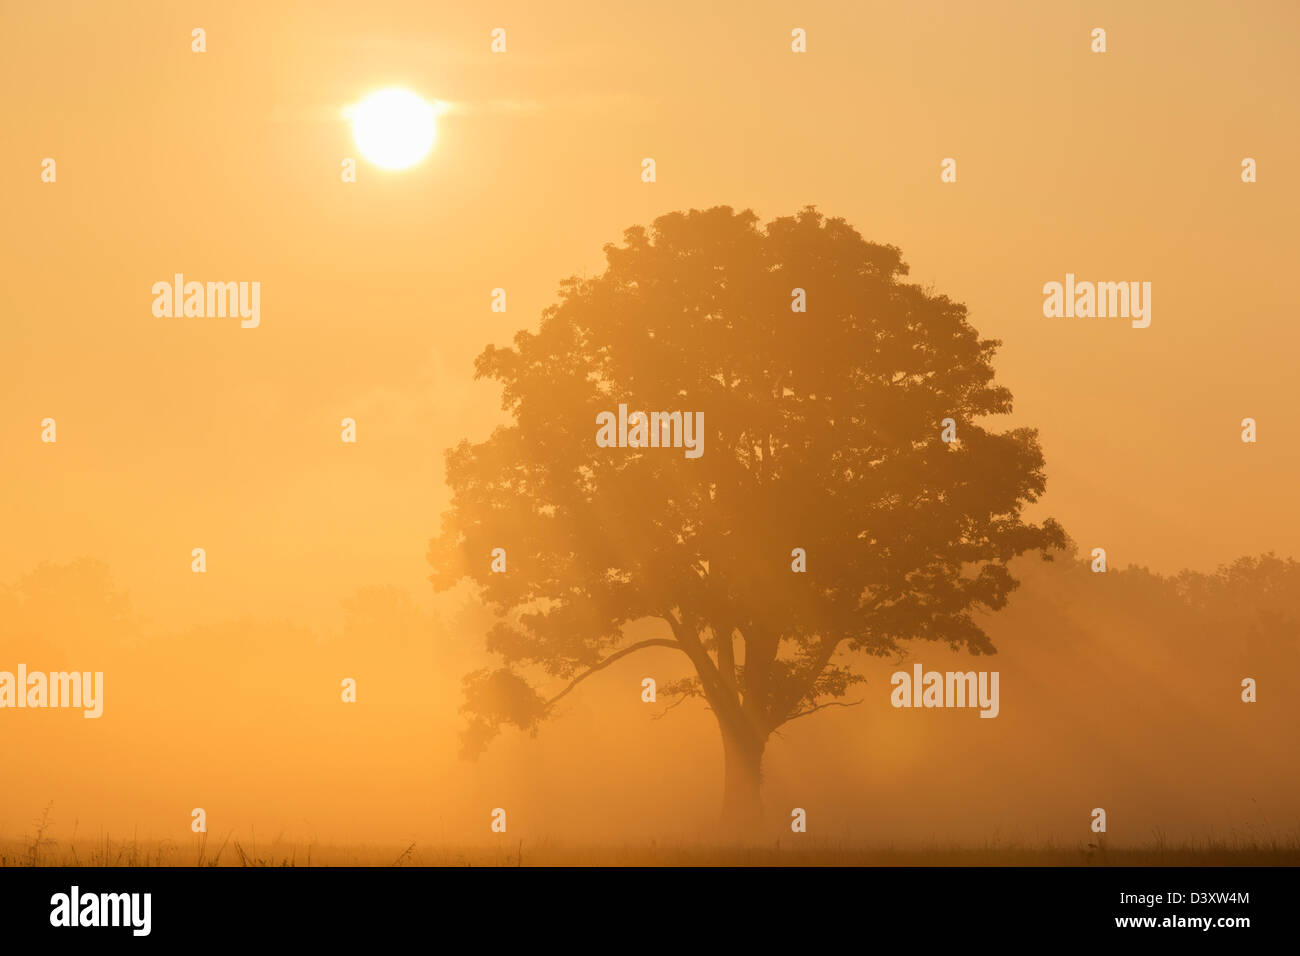 Oak Tree al amanecer. Imagen De Stock